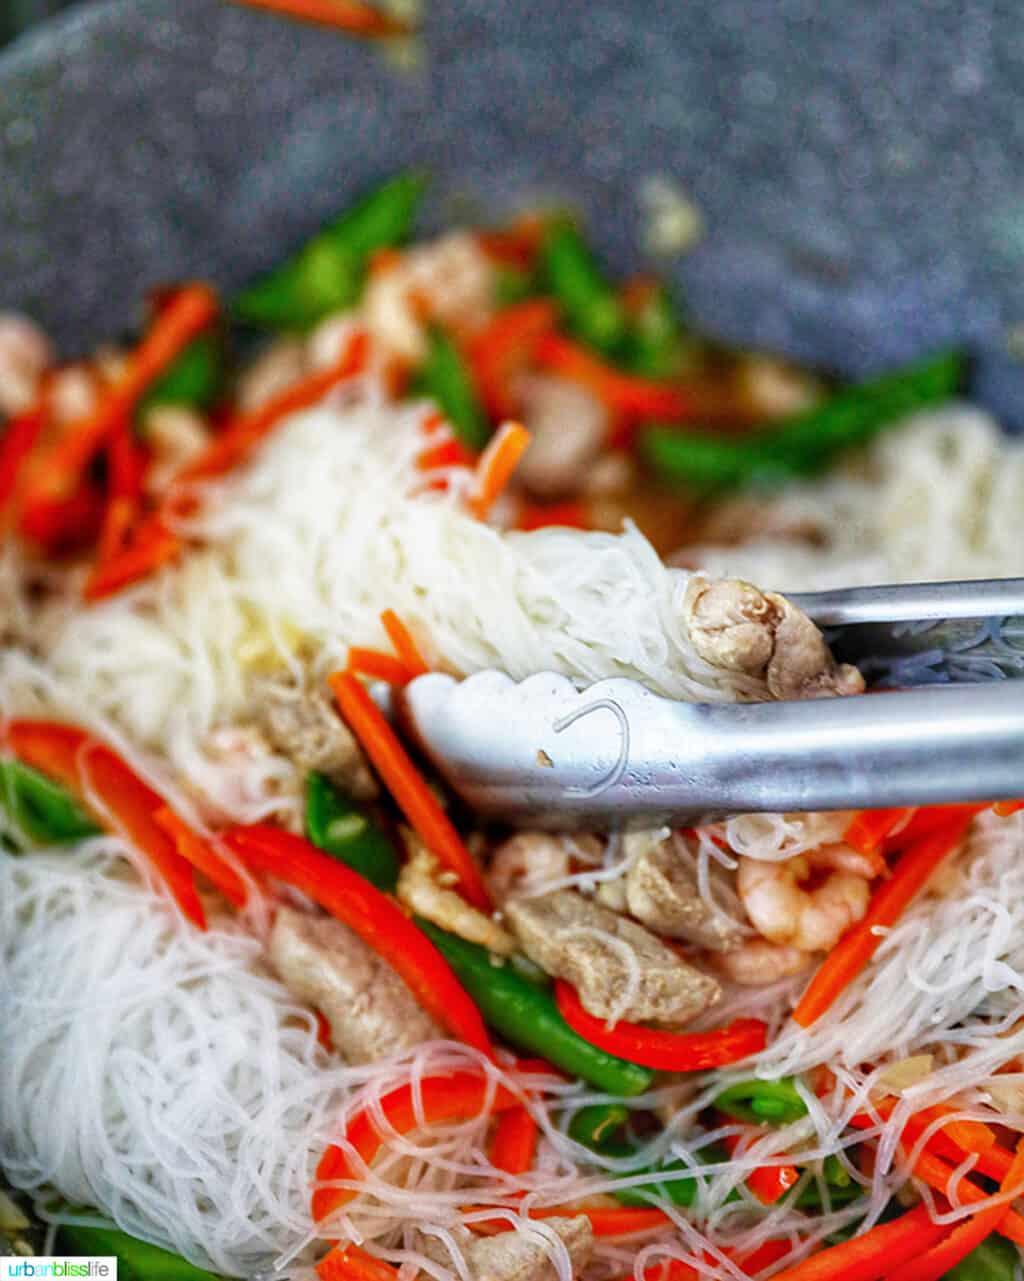 tongs mixing noodles into Filipino Pancit Bihon